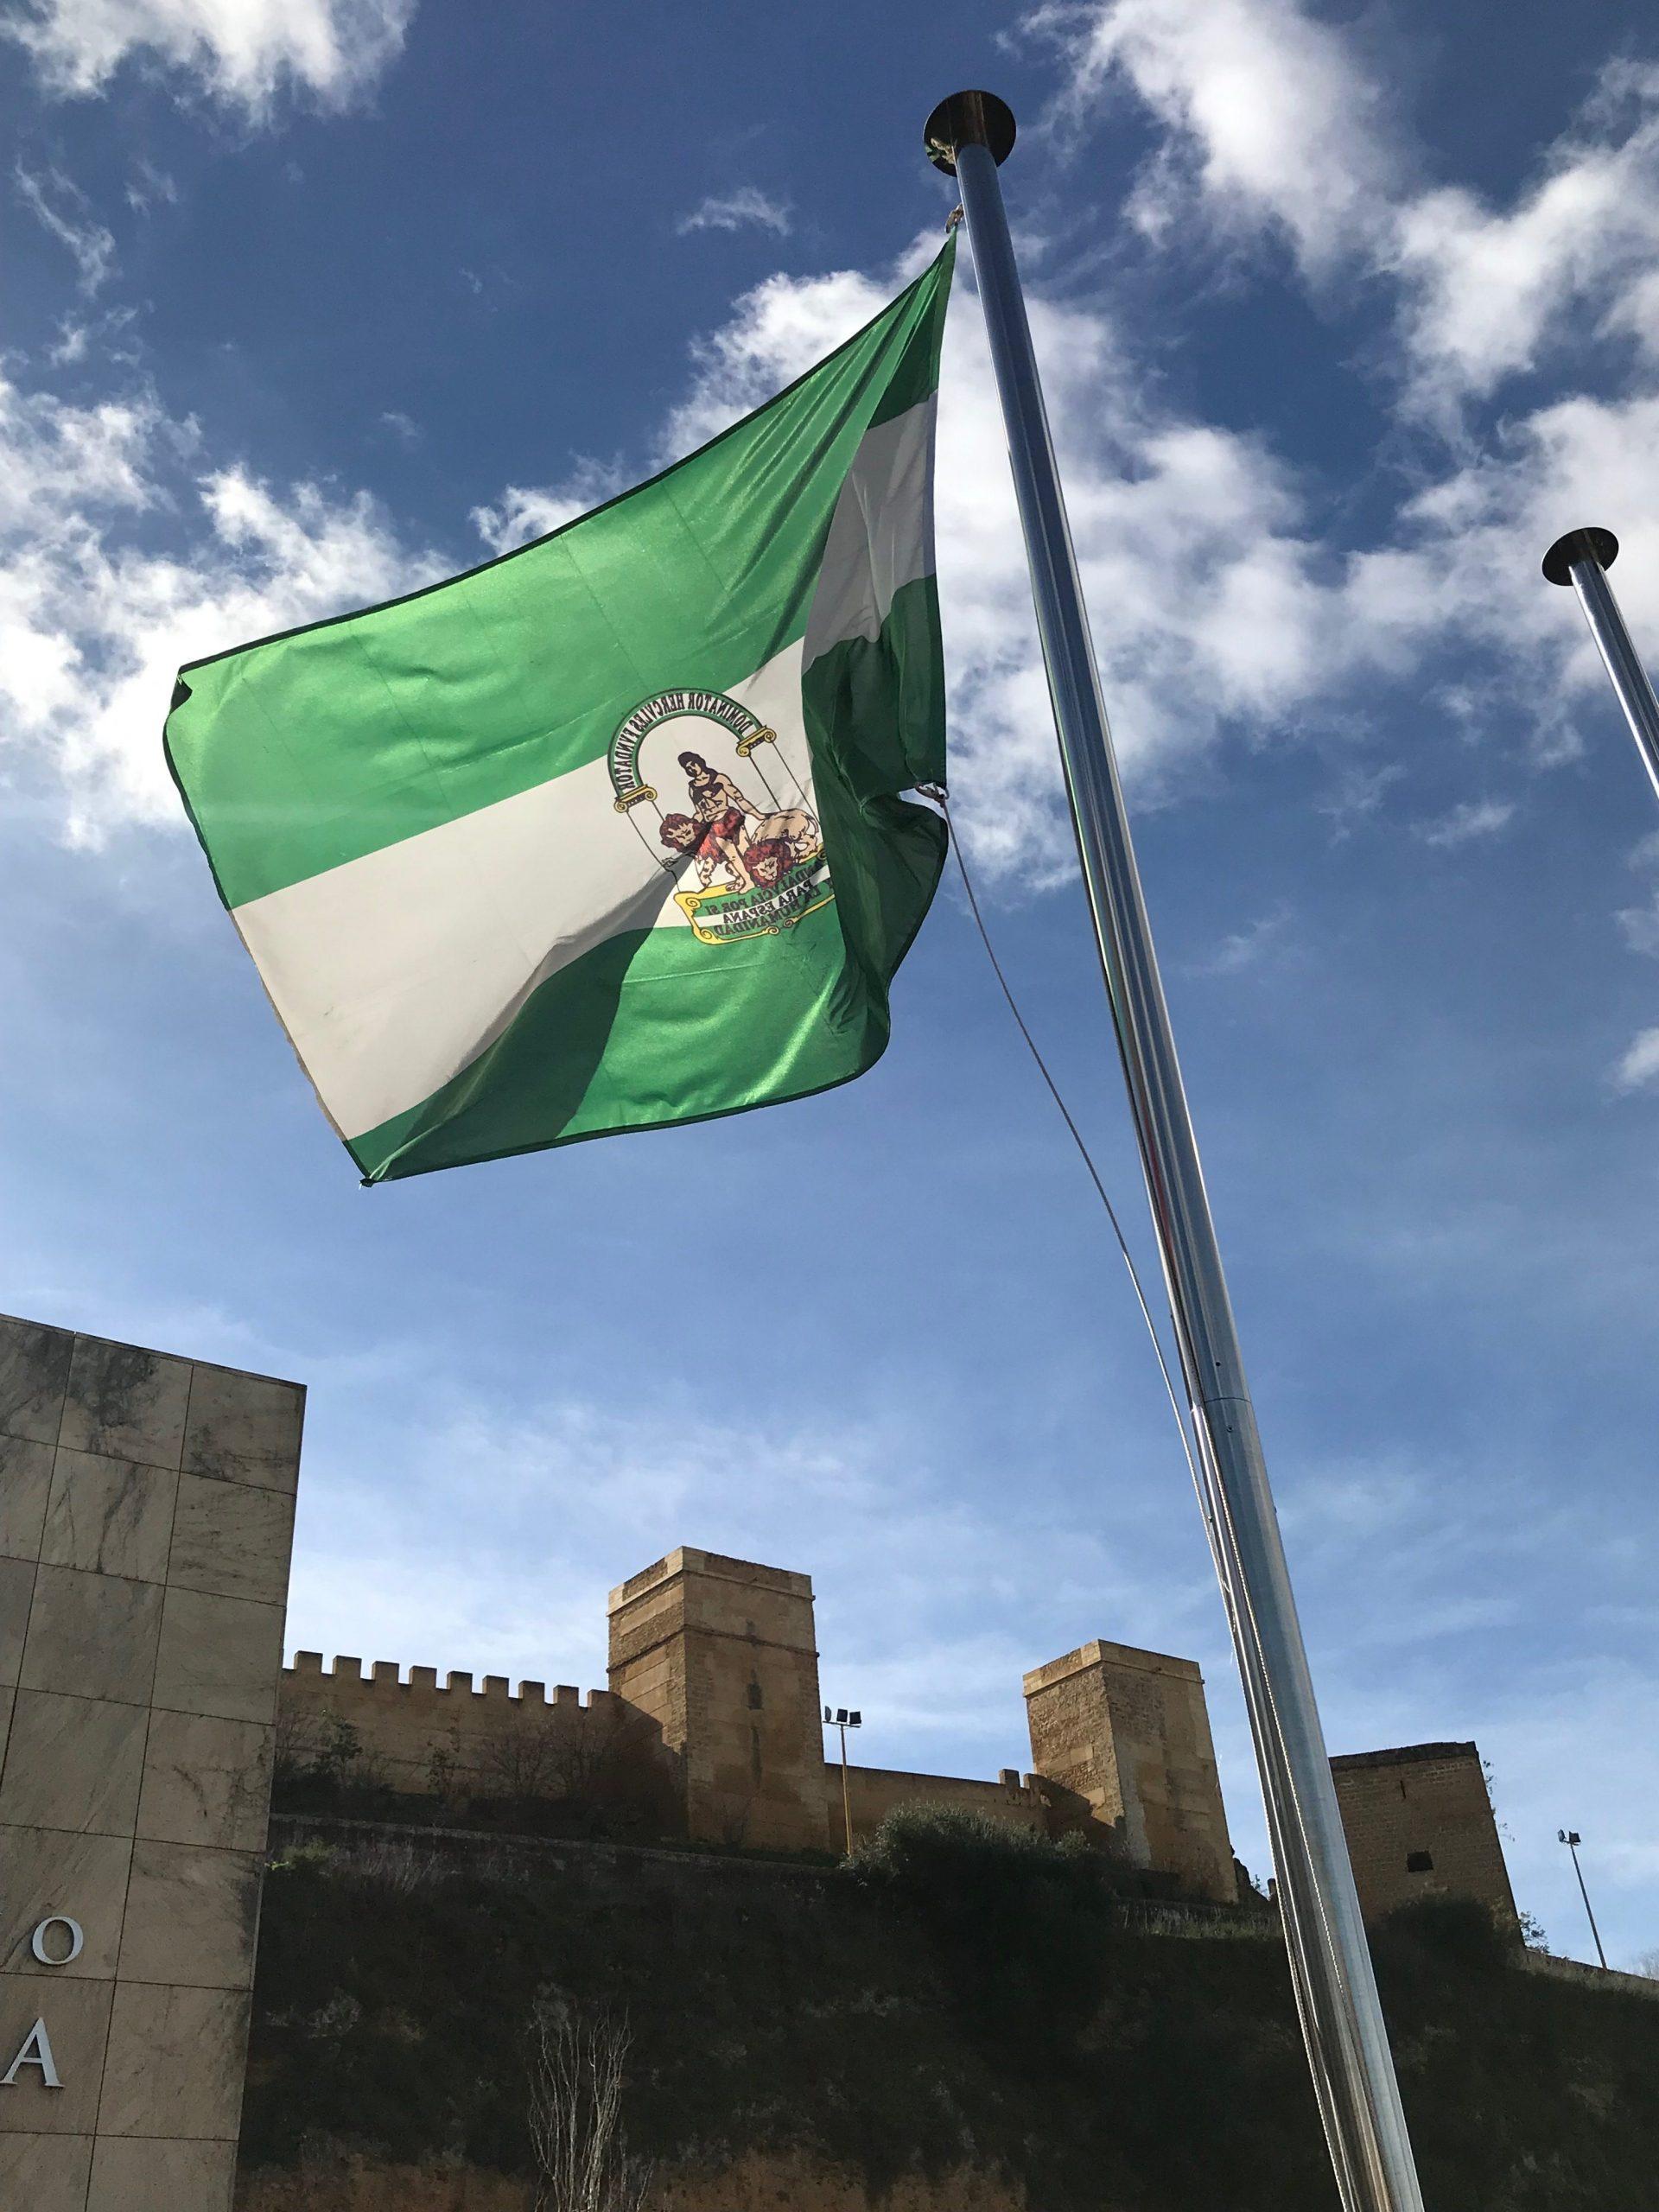 Foto-bandera-Andalucía-a-pies-castillo-e1551179384403